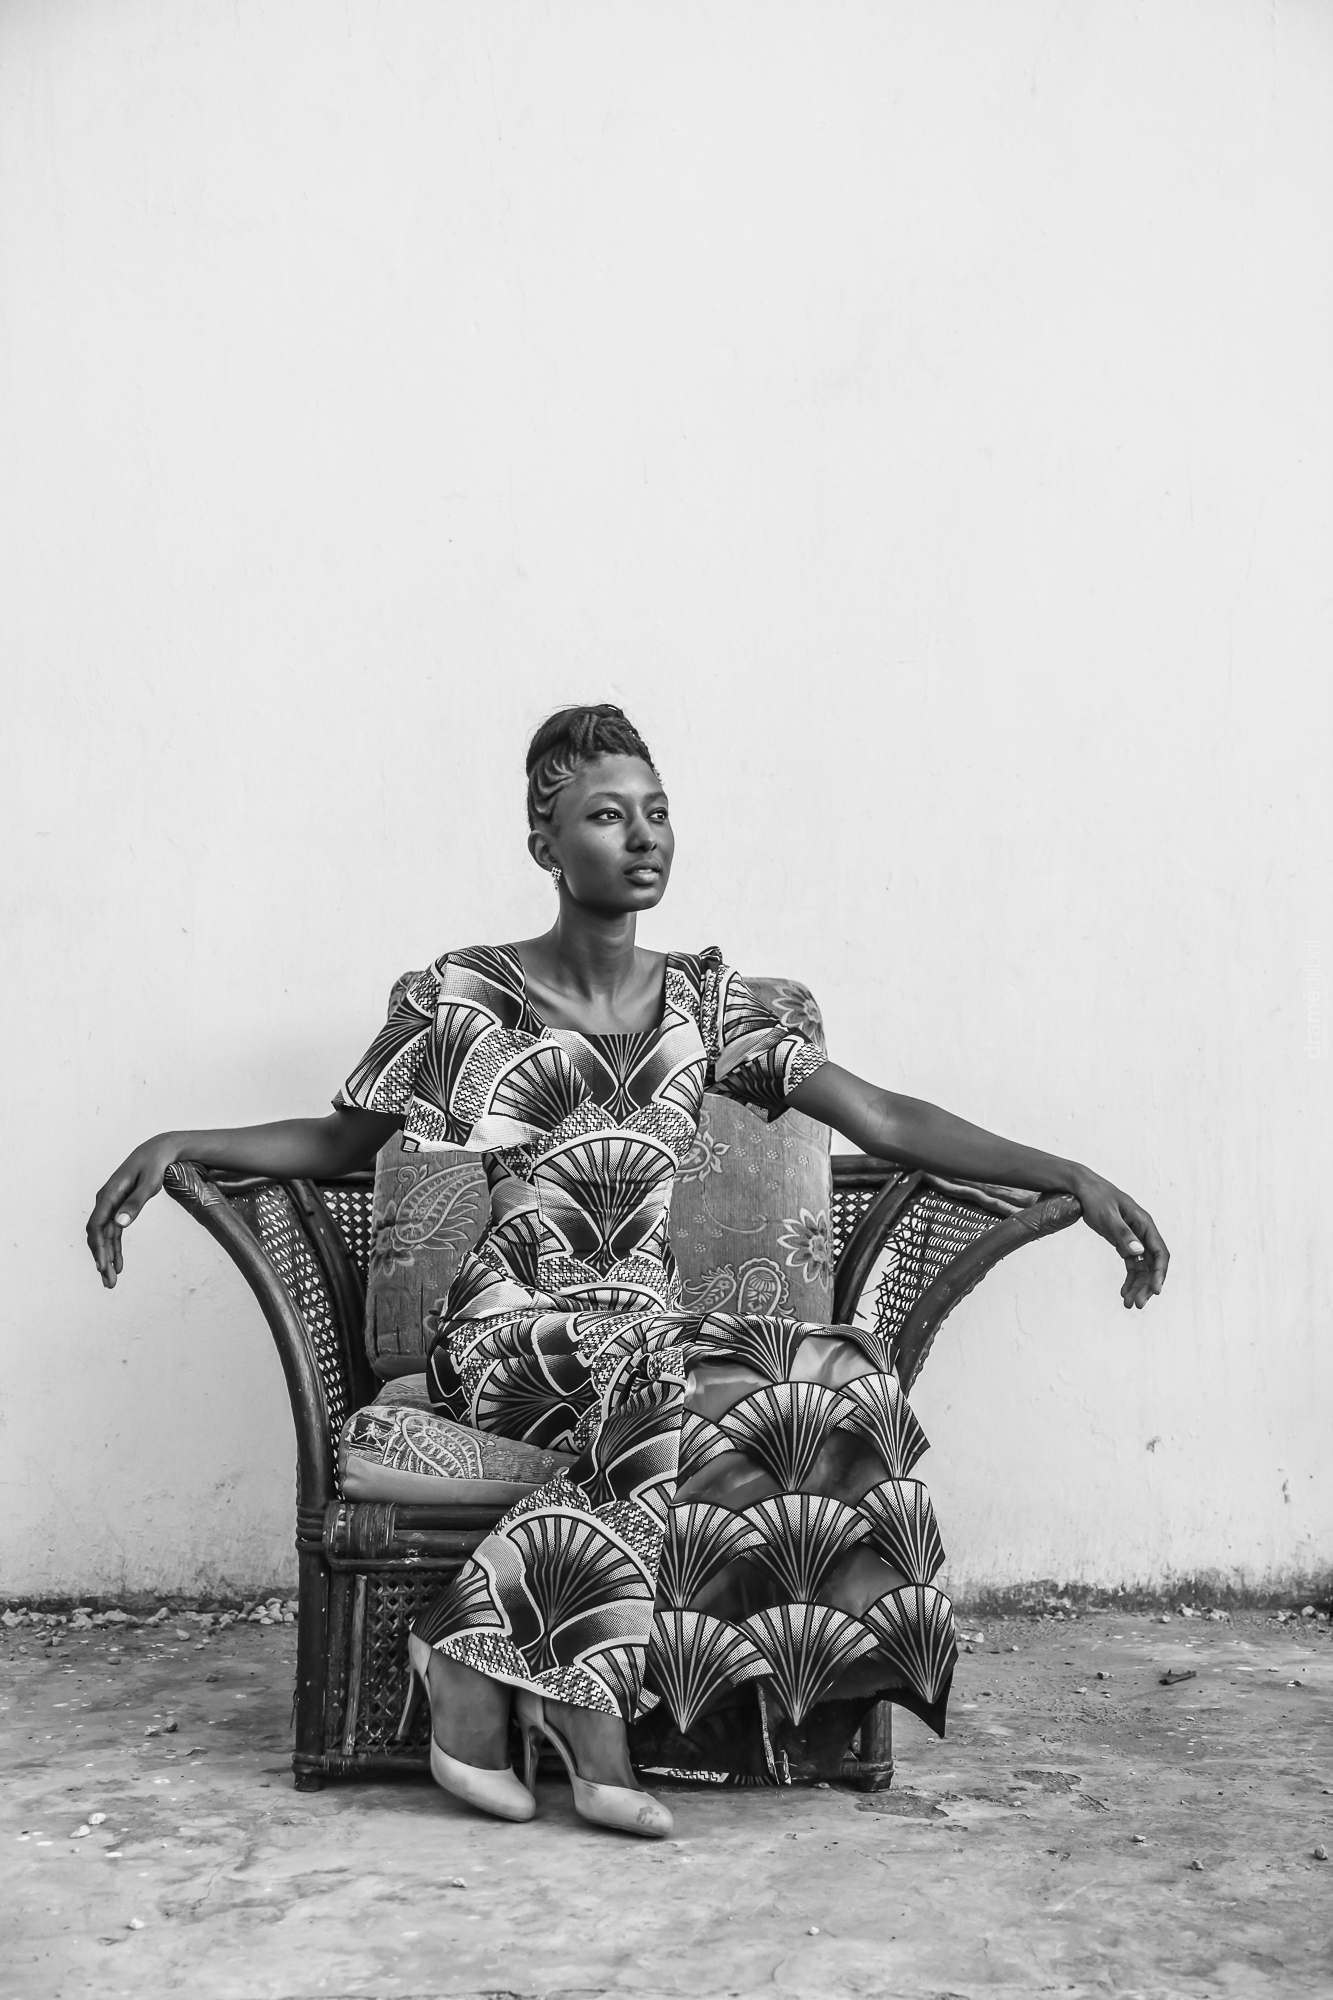 PortraitsofTabaskifiest-Senegal-3.jpg